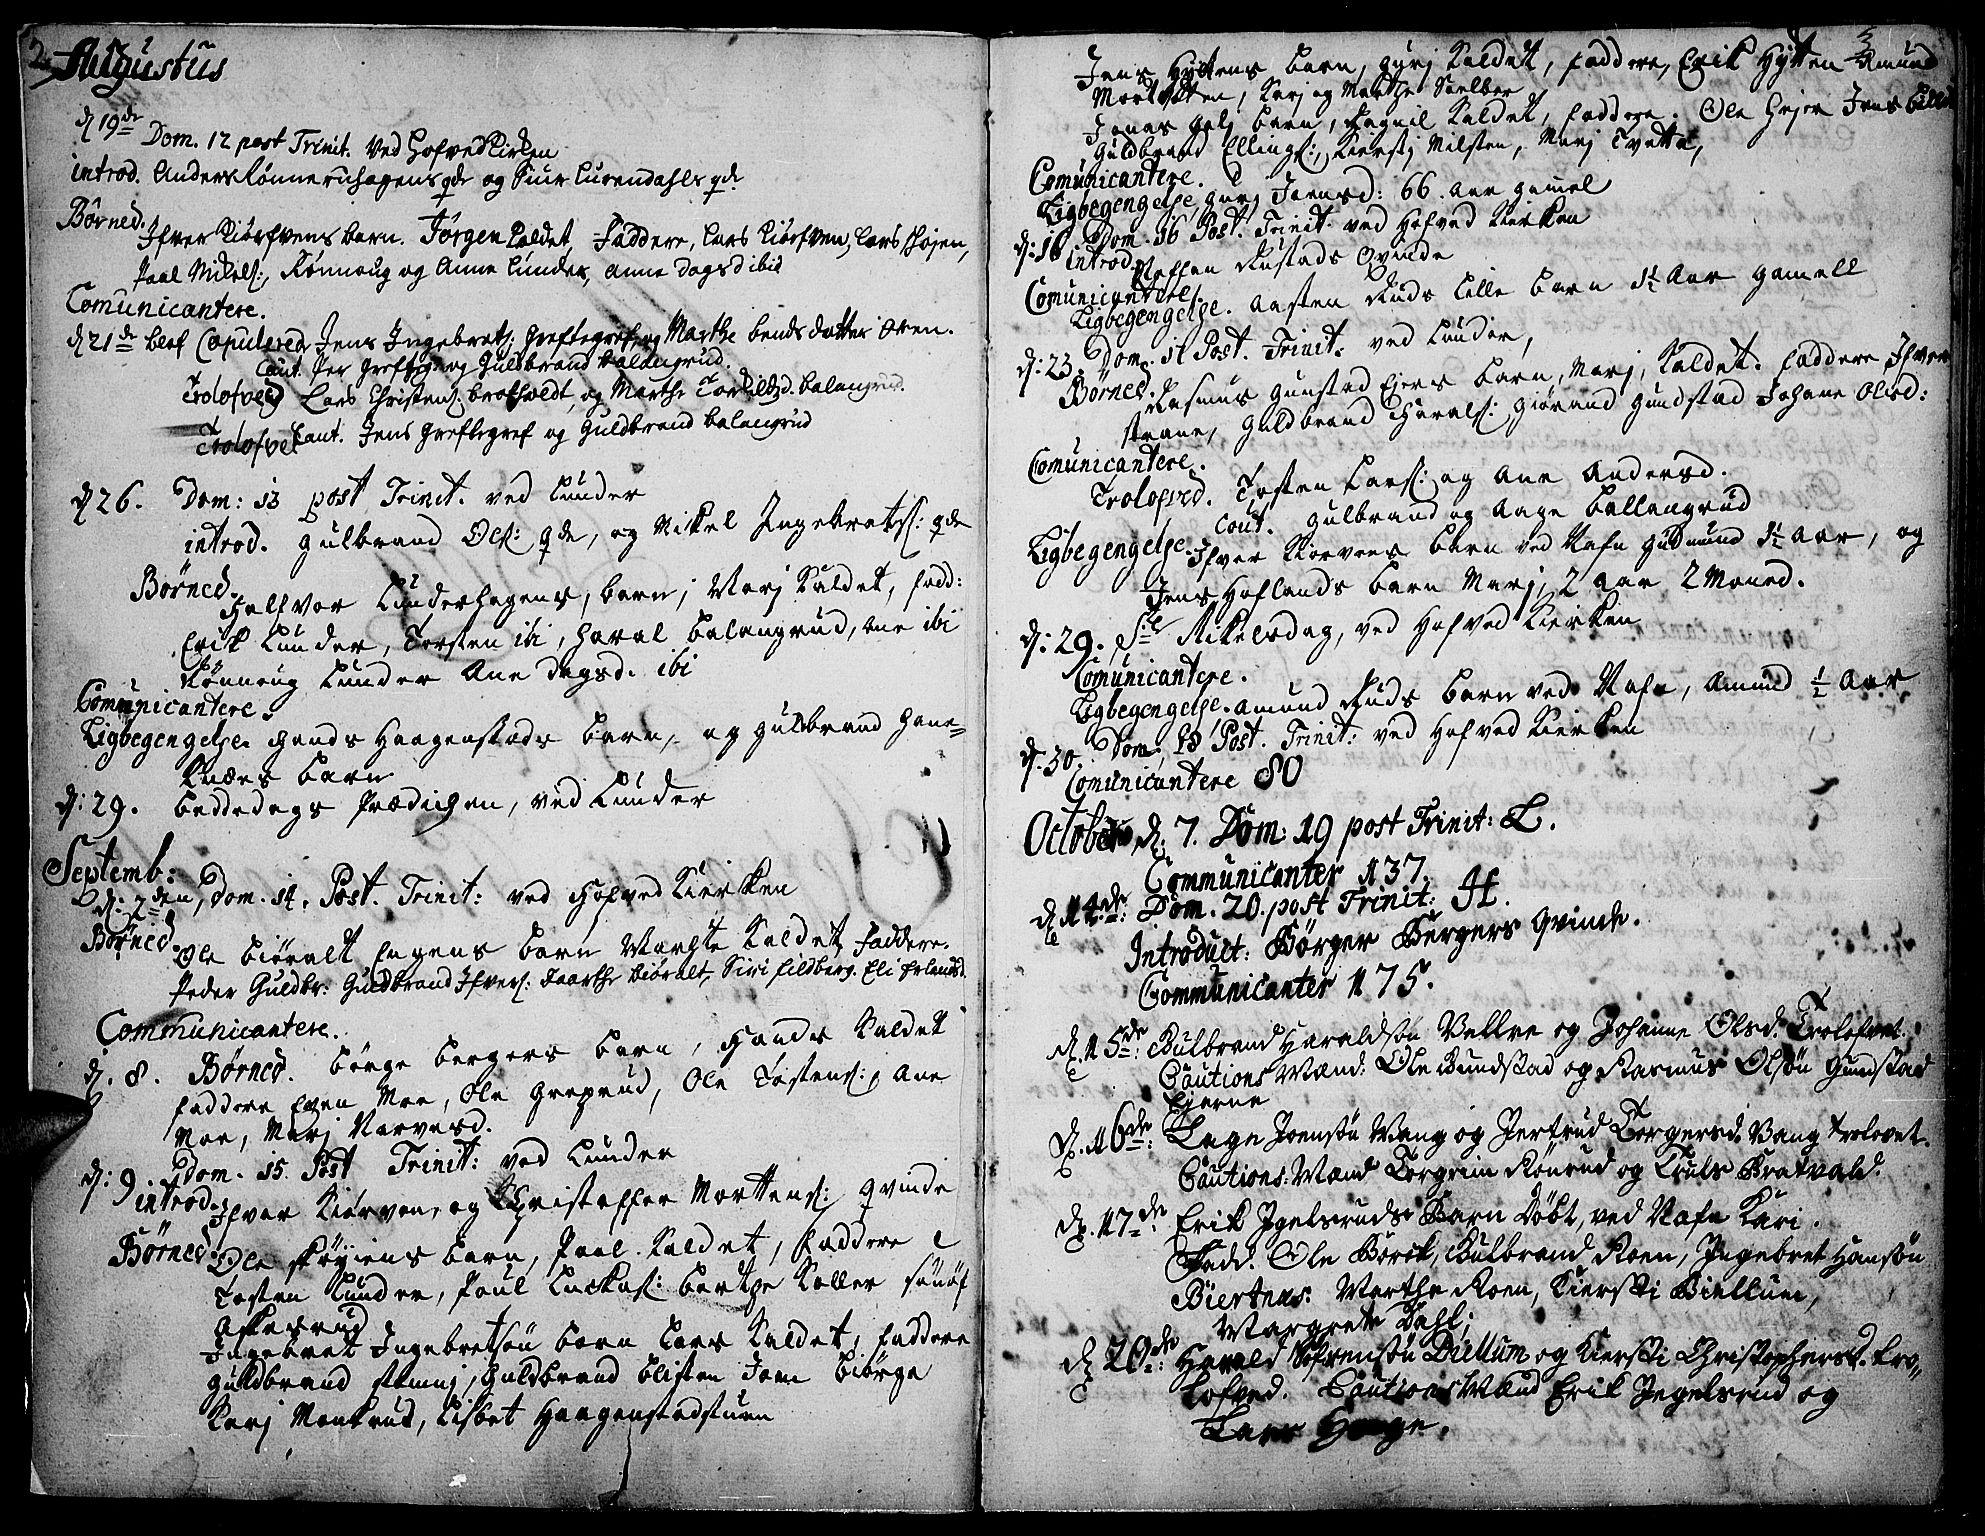 SAH, Jevnaker prestekontor, Ministerialbok nr. 2, 1725-1751, s. 2-3